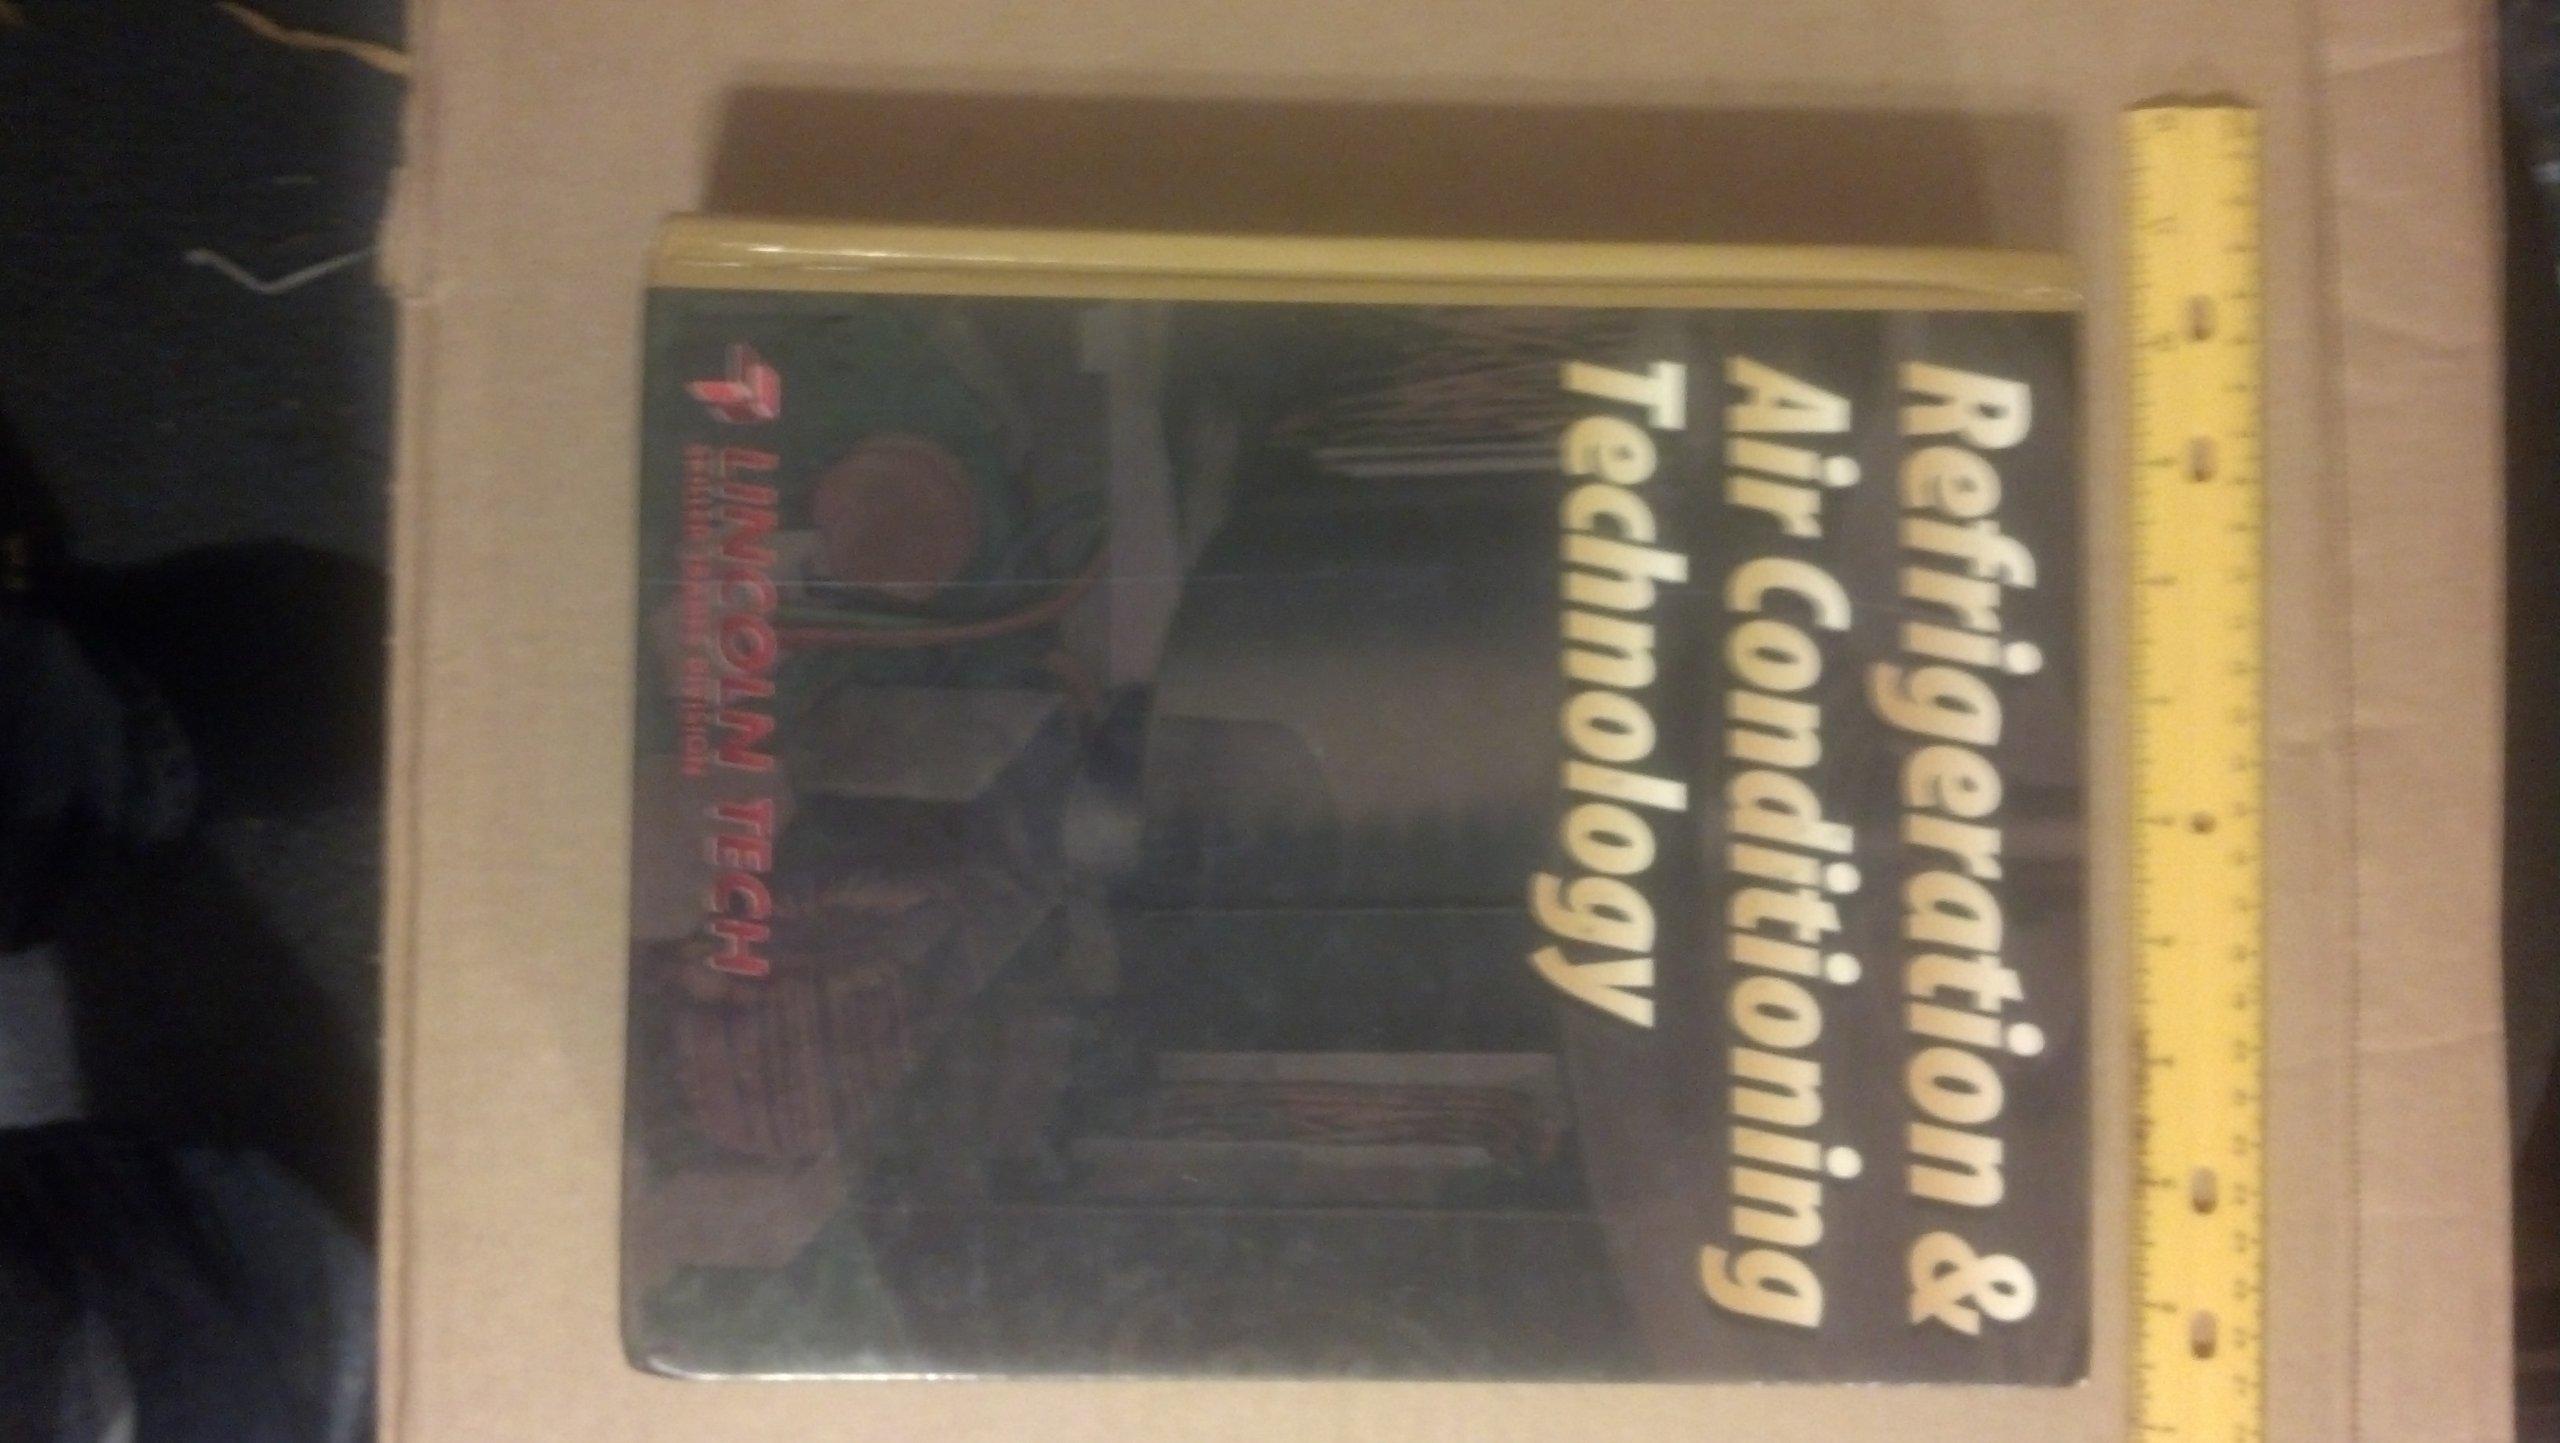 Refrigeration Air Conditioning Technology Lincoln Tech U 9781401890766 Amazon Com Books